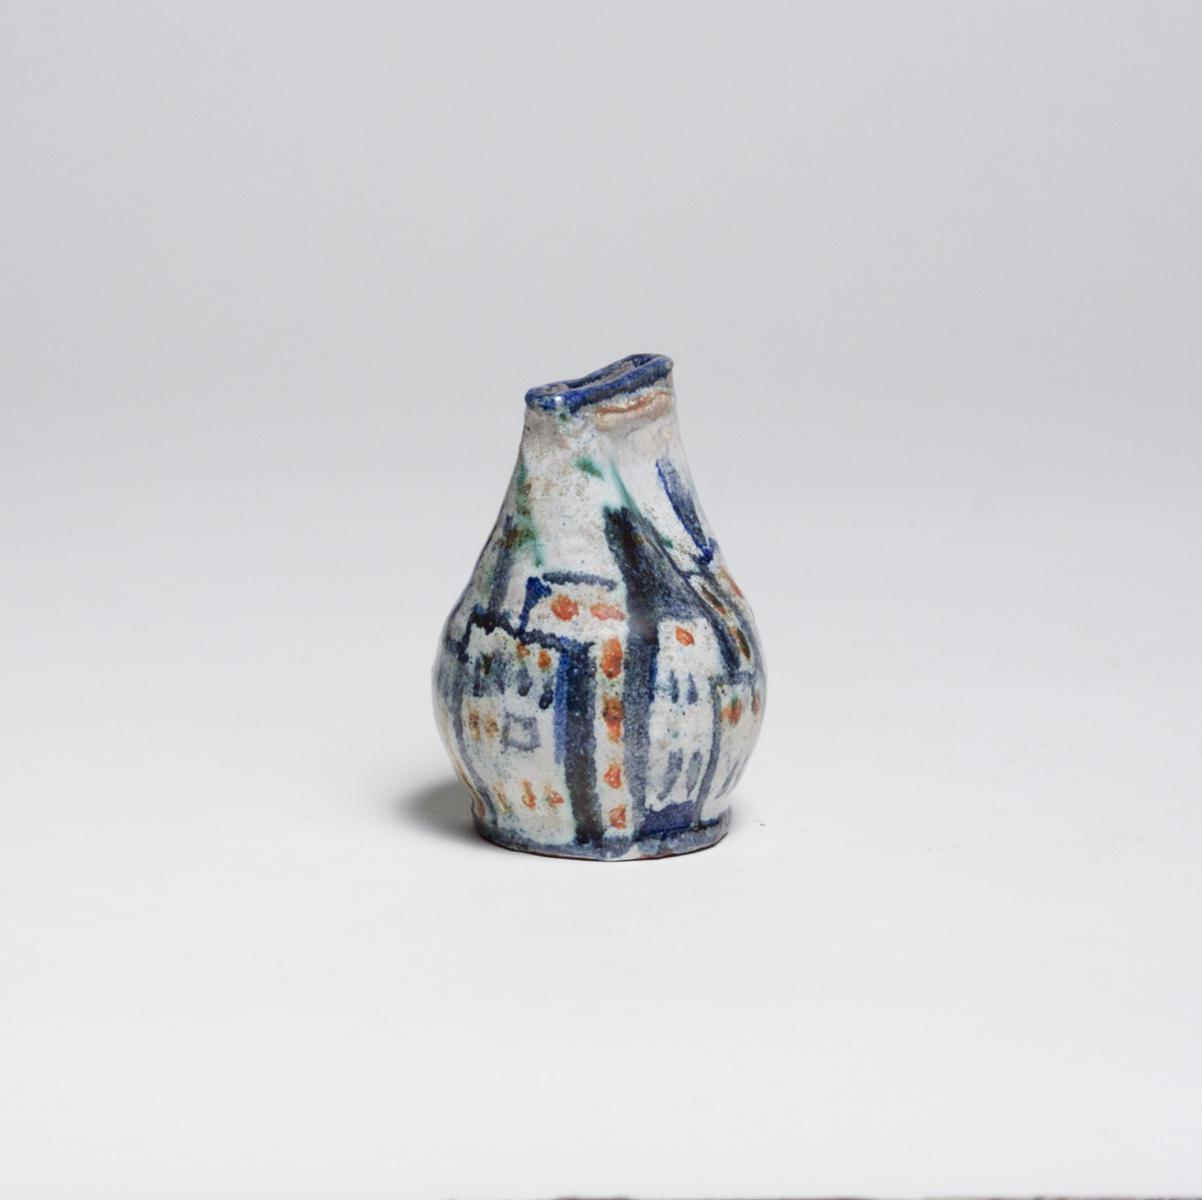 Gudrun Baudisch  Vase with Cityscape Motif 2